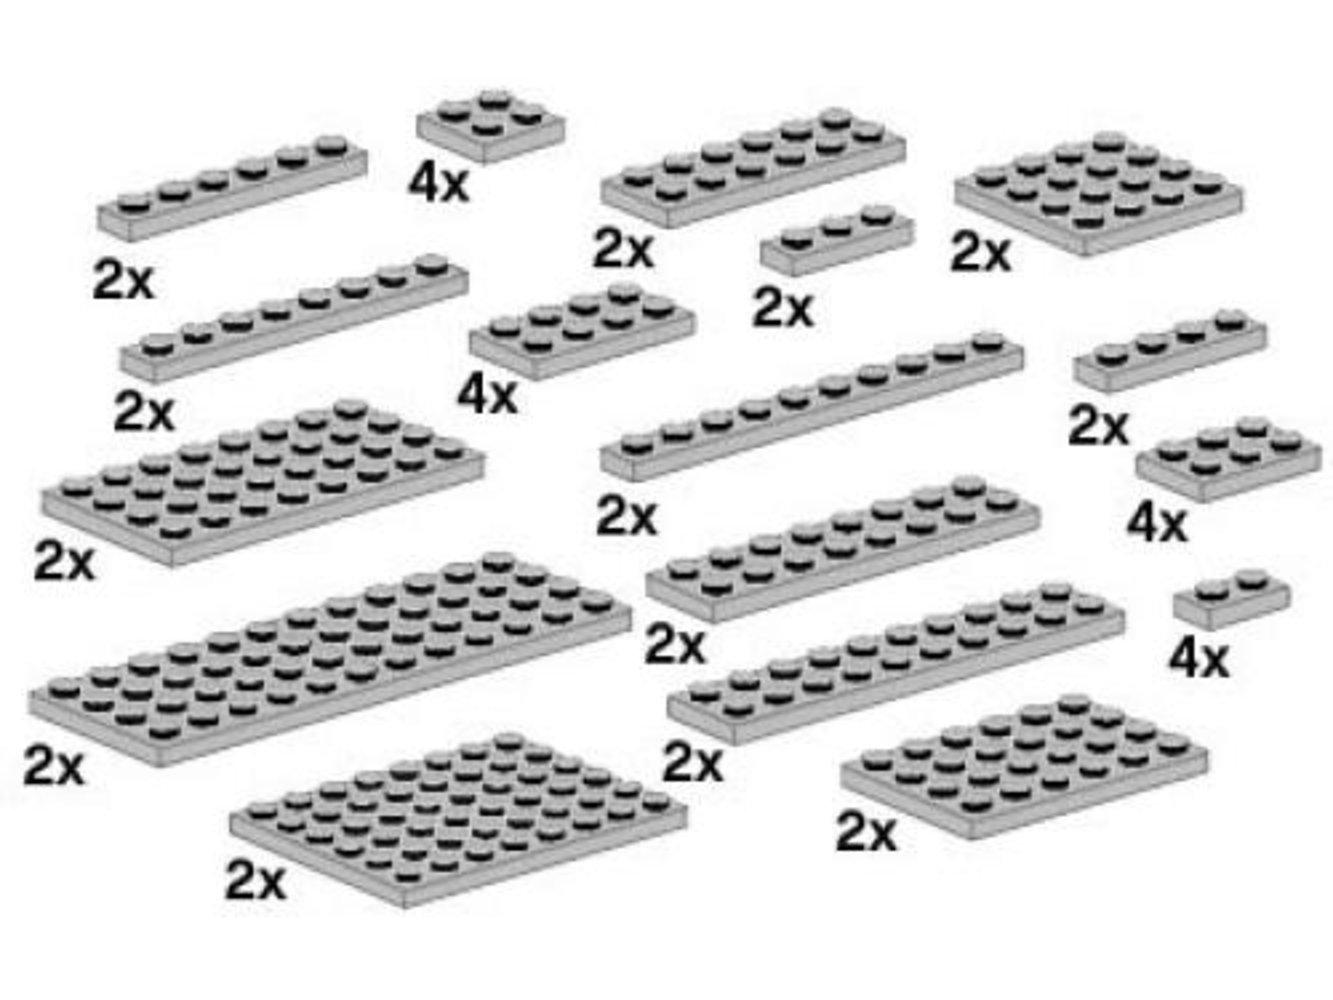 Assorted Light Gray Plates